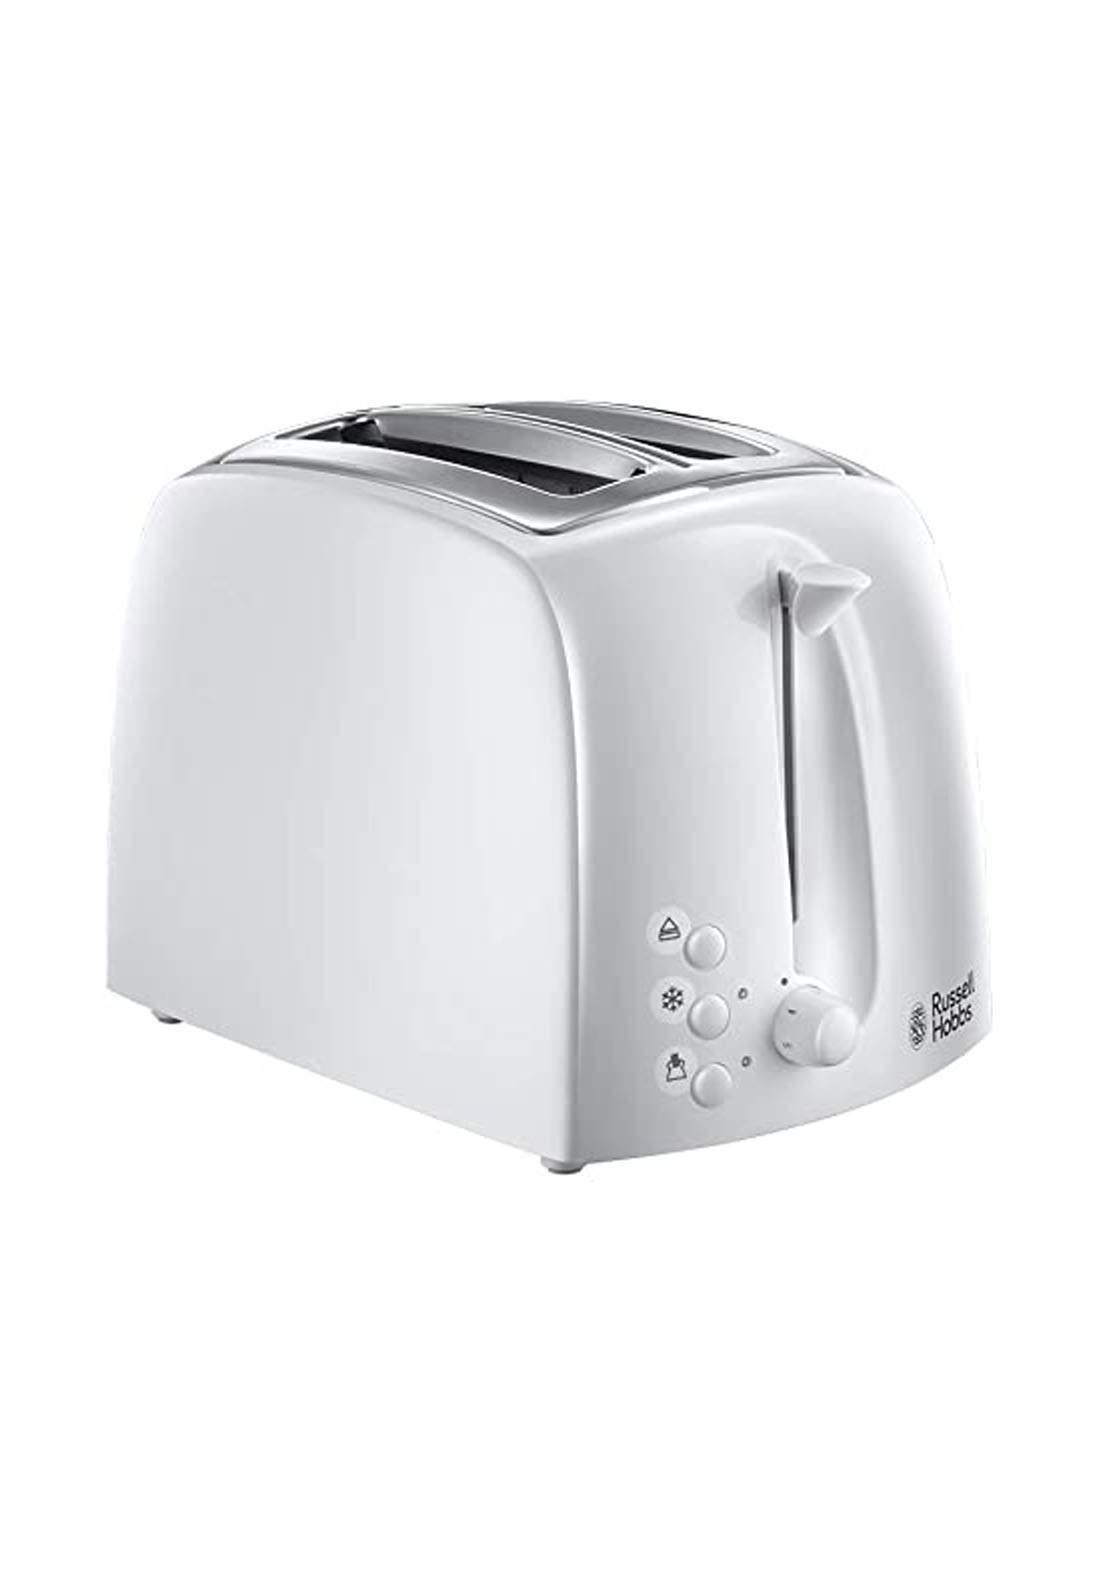 Russell hobbs 21640 Russell Hobbs Textures 2-Slice Toaster محمّصة خبز كهربائية